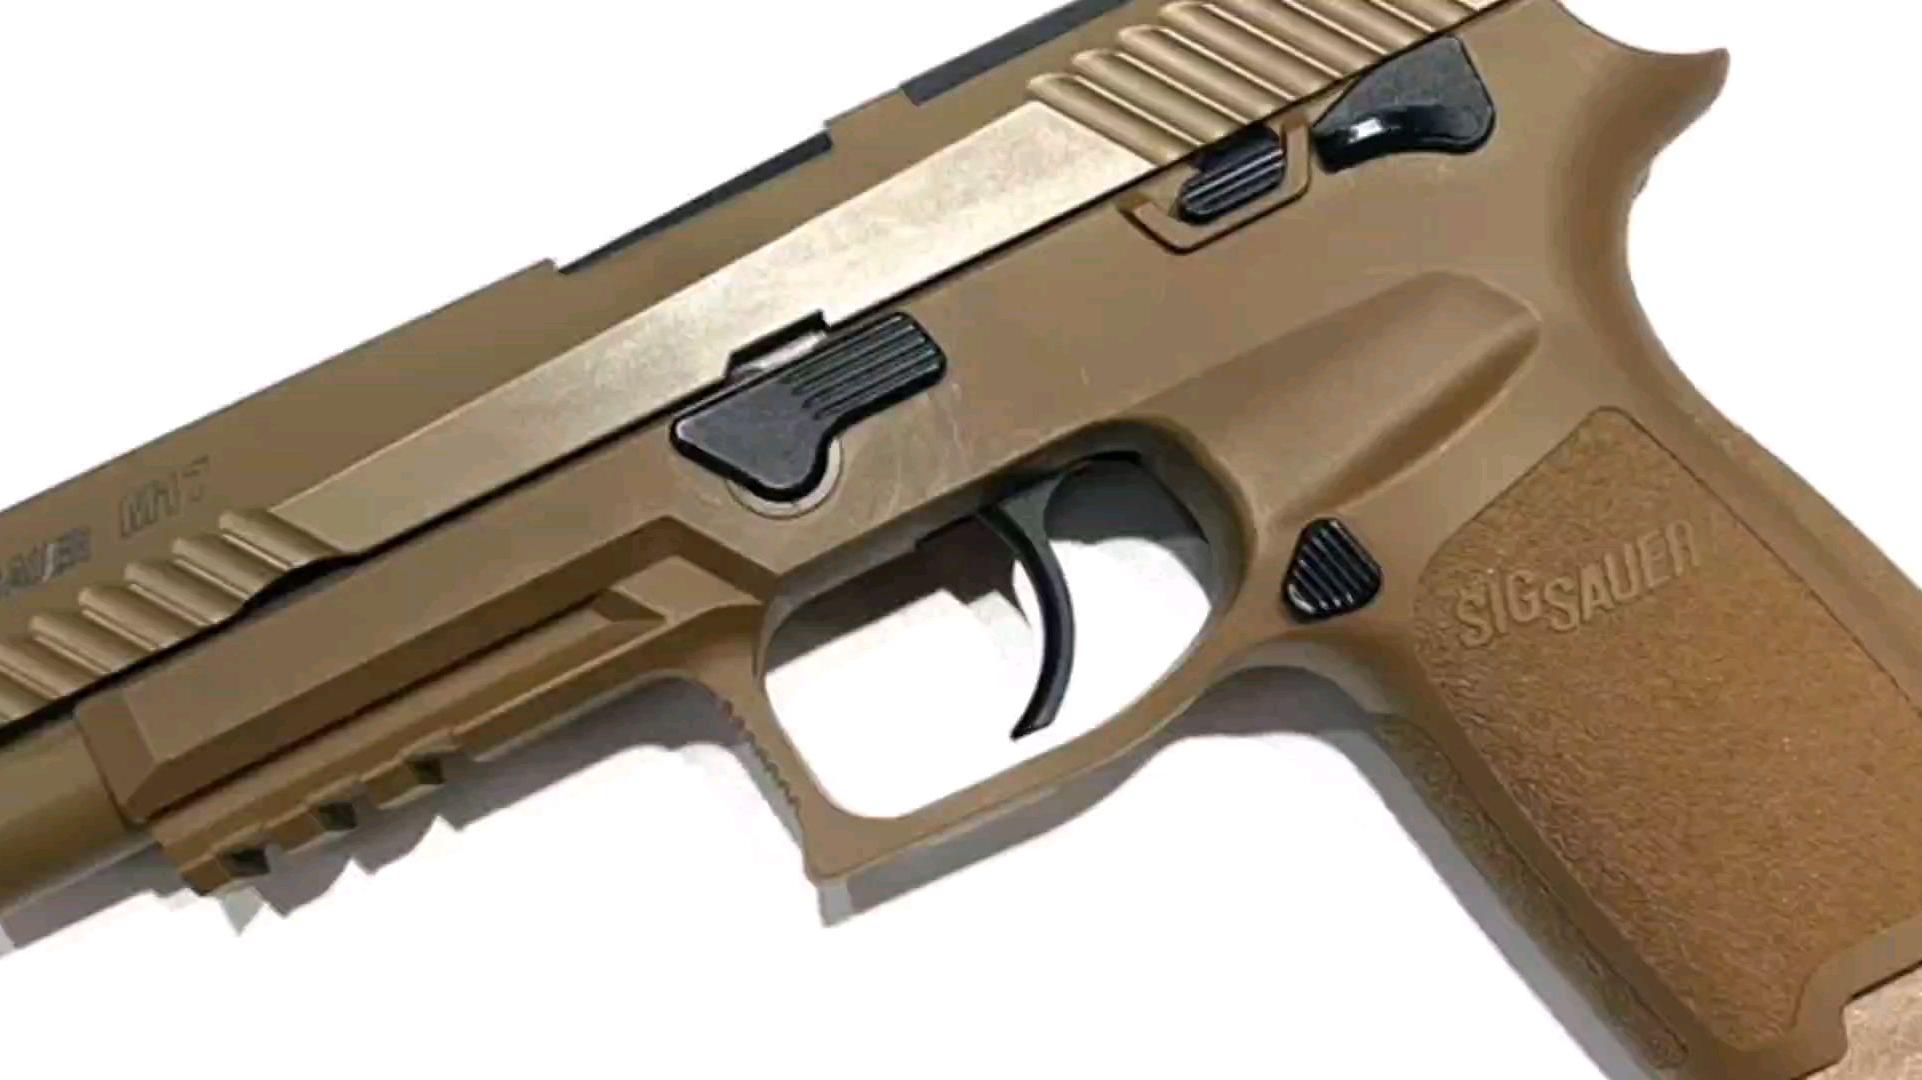 SiG SAUER M17(P320)官方授权版测试